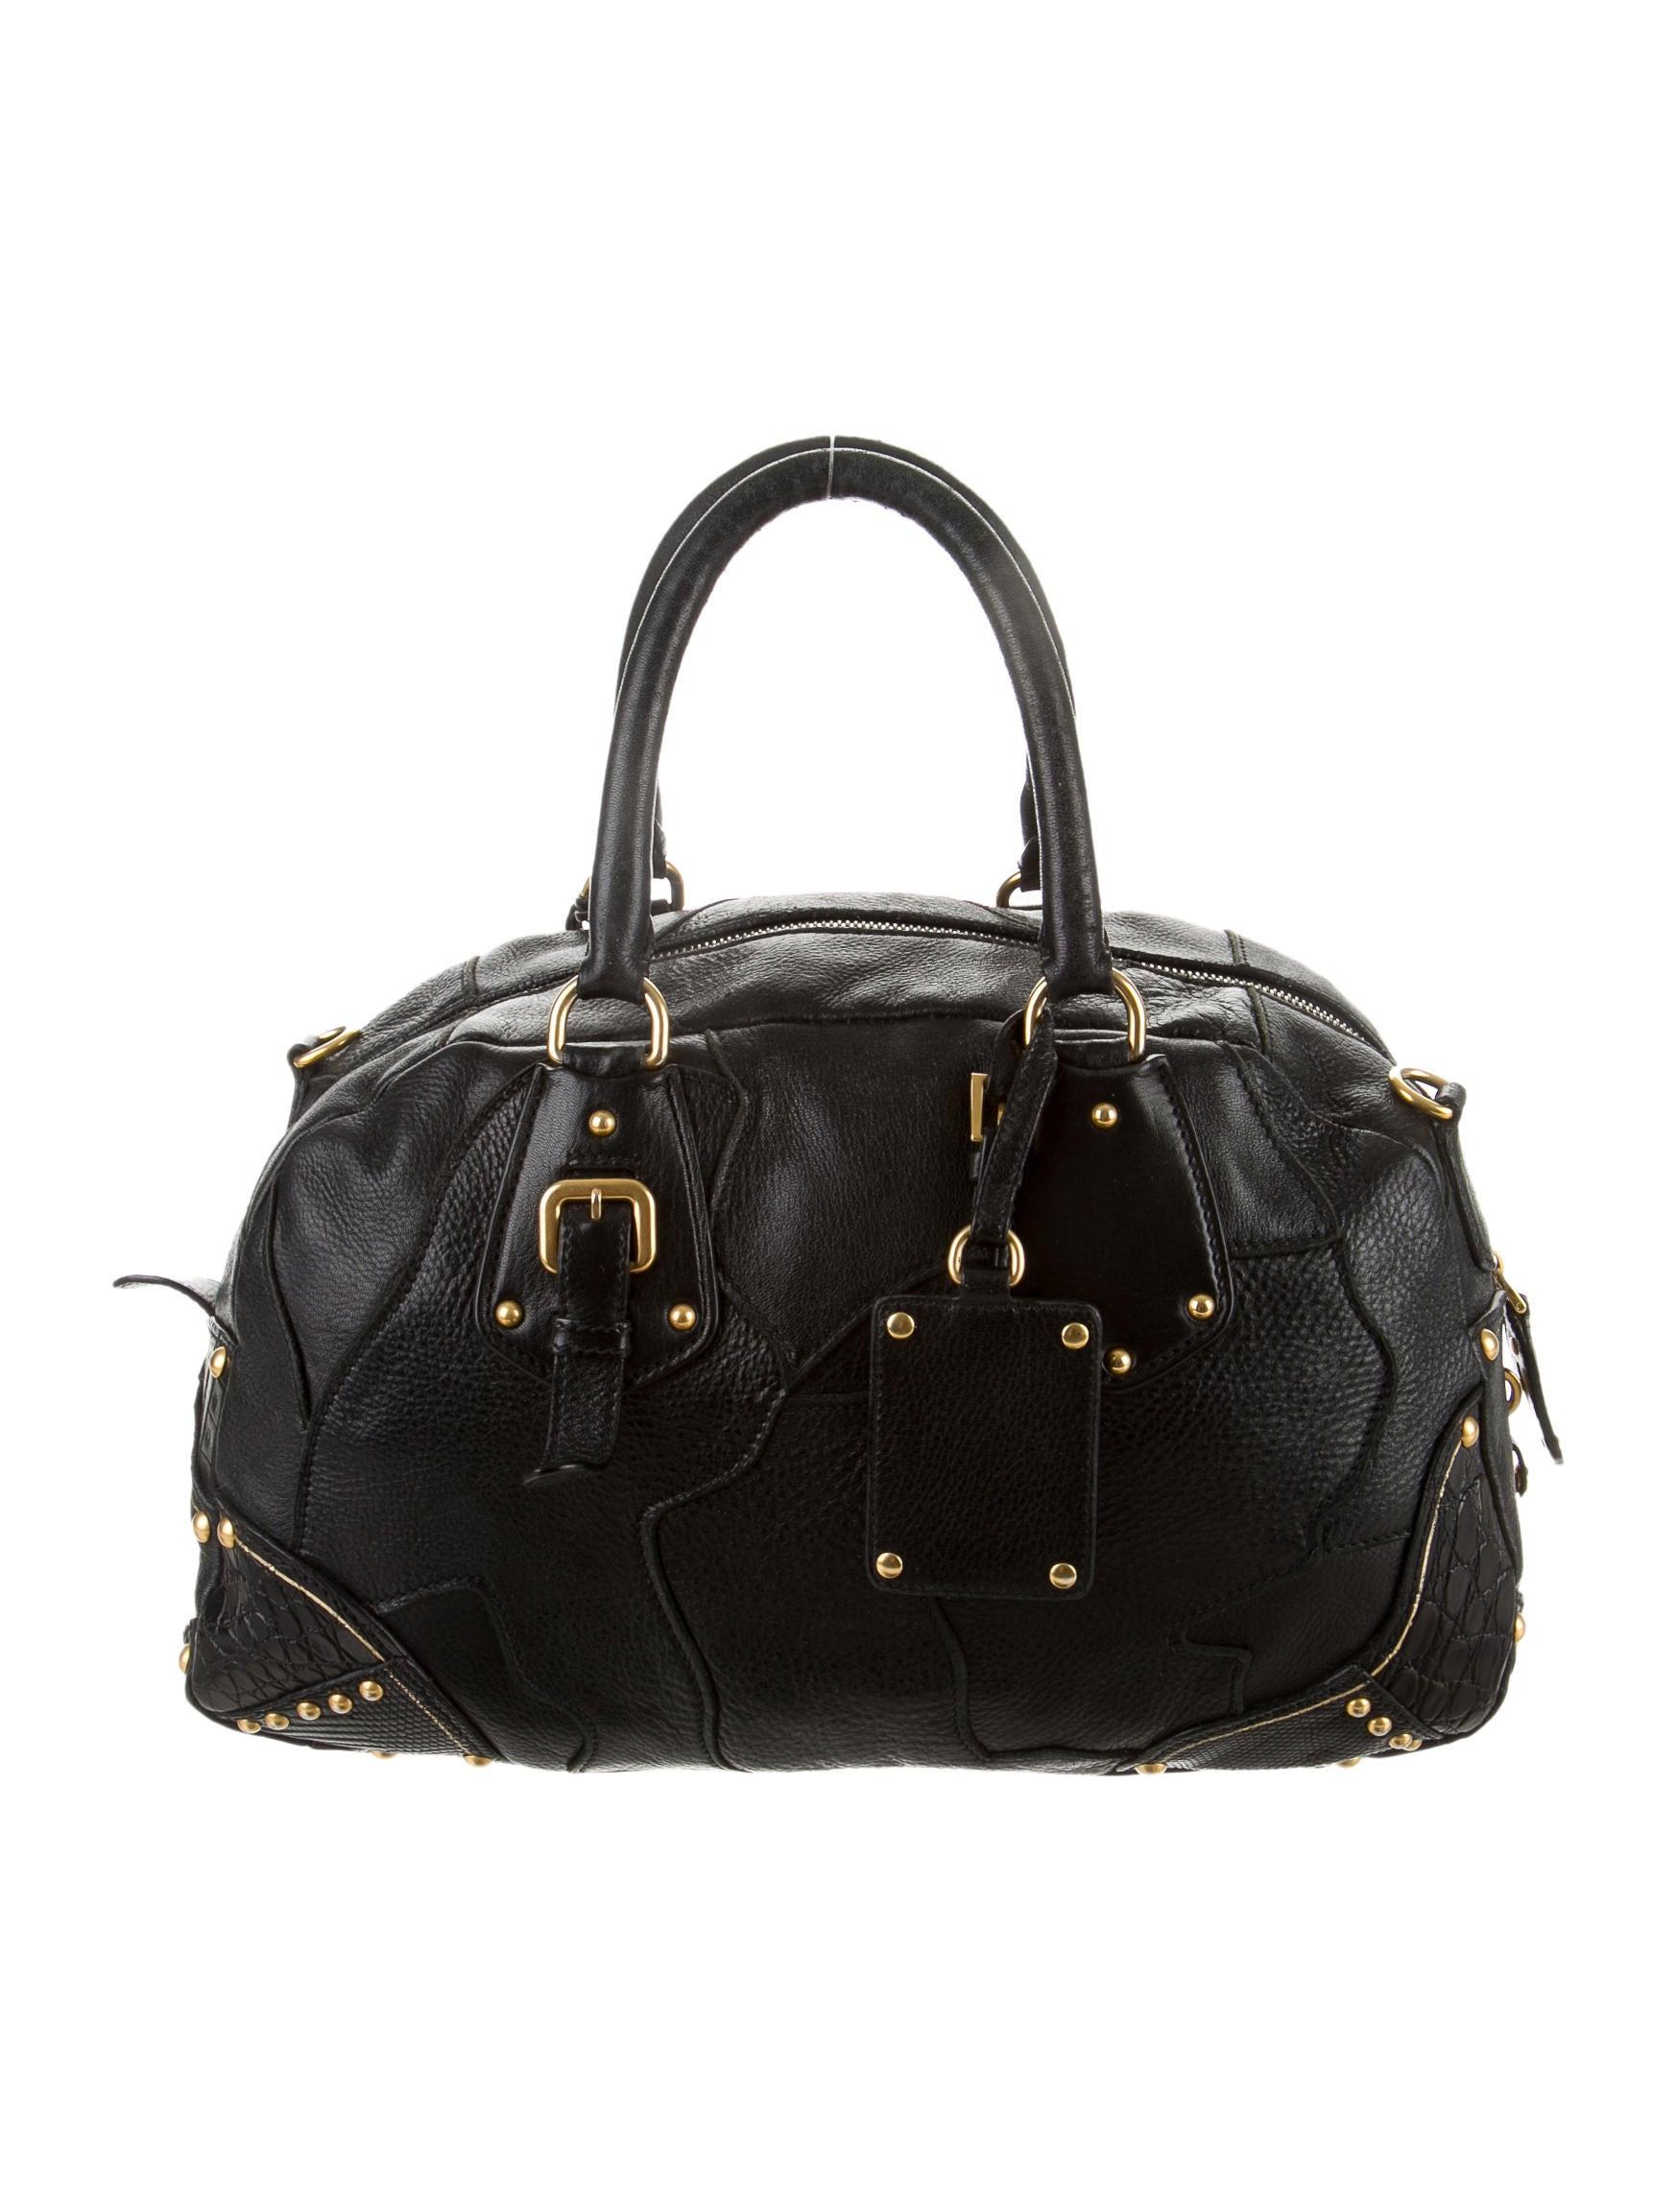 Prada Fringe Satchel - Handbags - PRA81588 | The RealReal